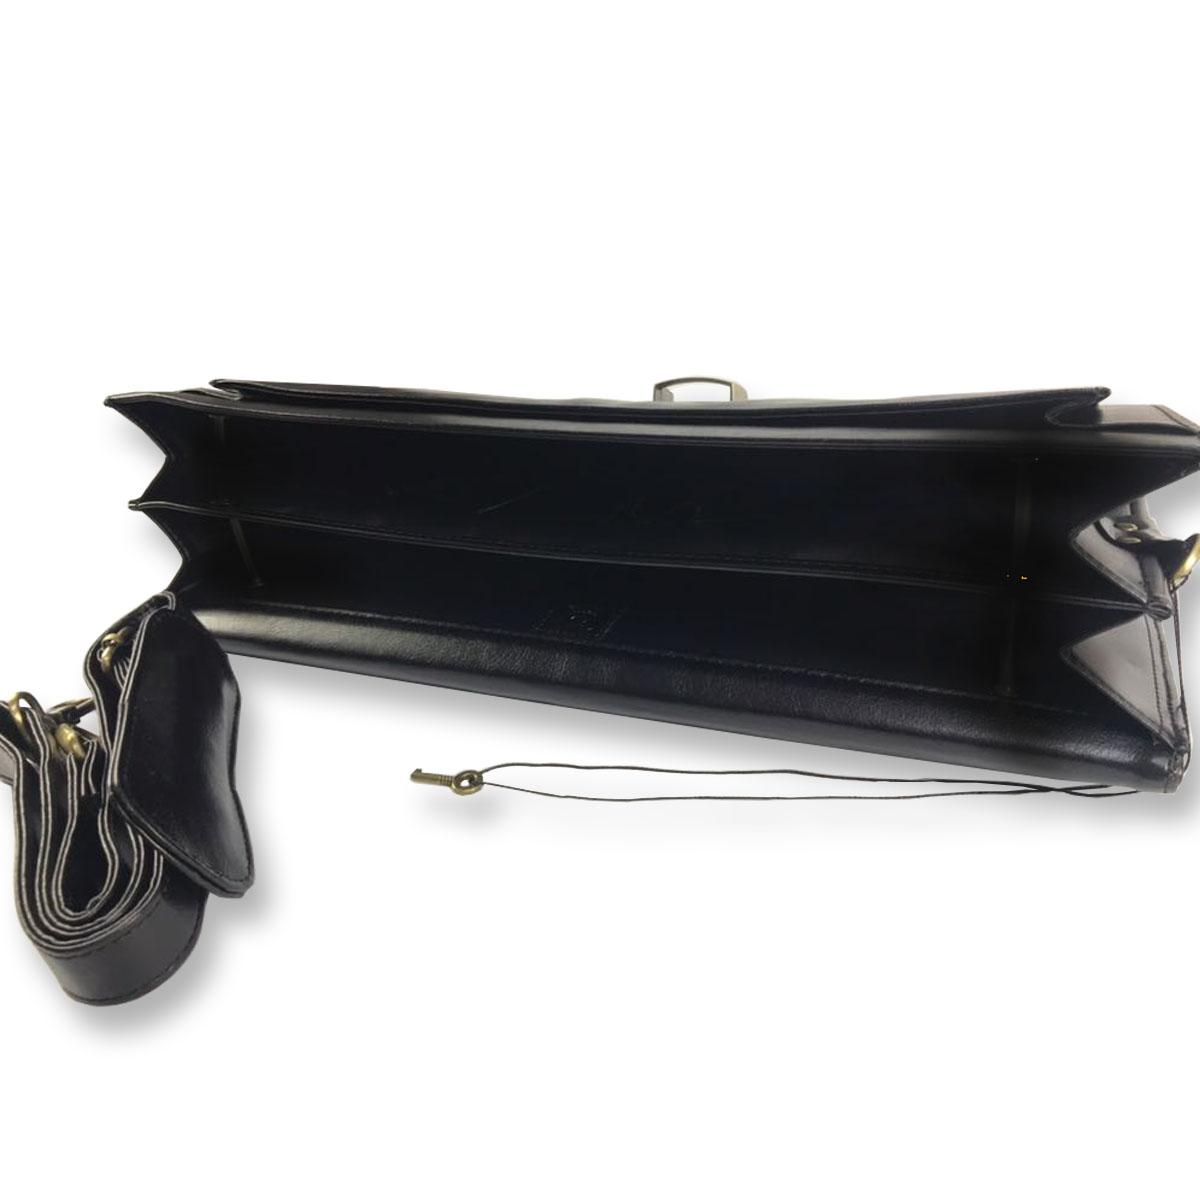 7ec82f6ef Maleta Executiva Vintage Design Notebook Luxcel EX20006LX-Preto R$ 239,90 à  vista. Adicionar à sacola